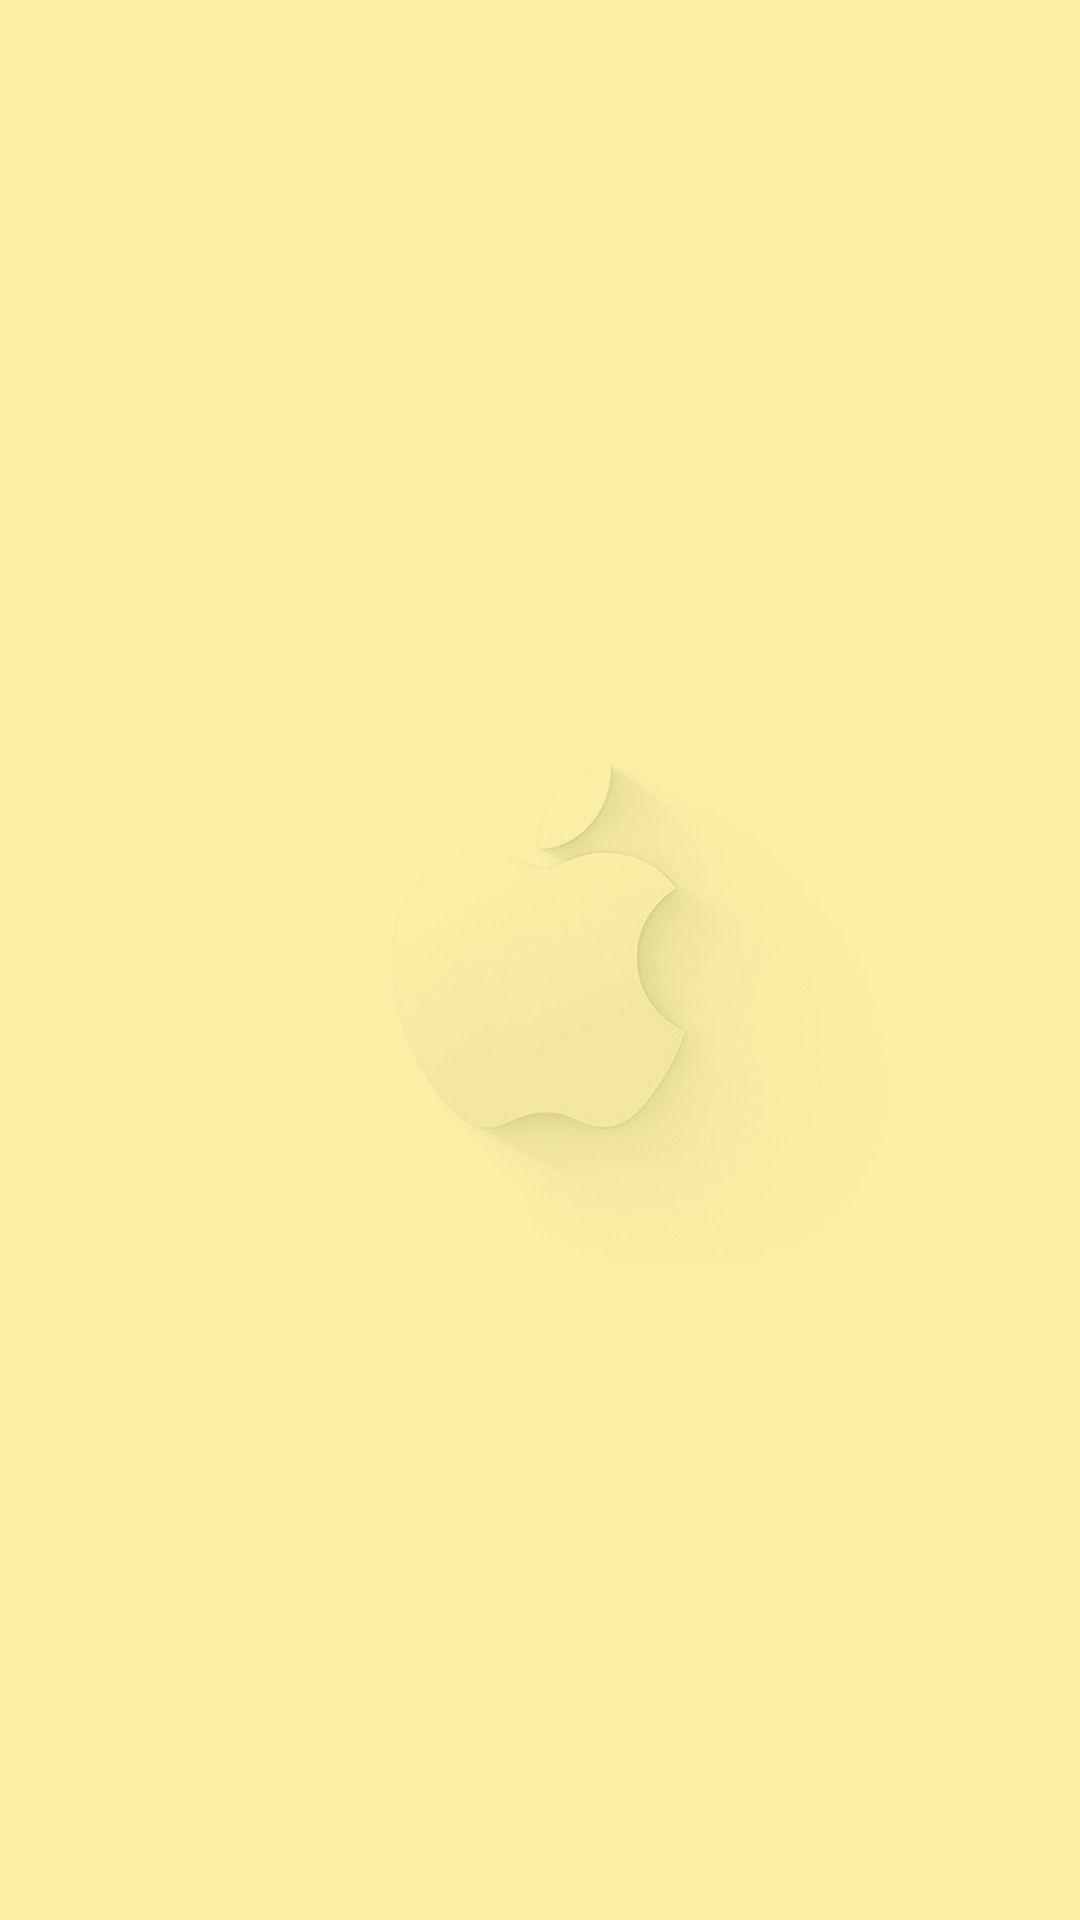 Pastel Yellow Wallpaper Iphone : pastel, yellow, wallpaper, iphone, Yellow, IPhone, Wallpapers, Backgrounds, WallpaperAccess